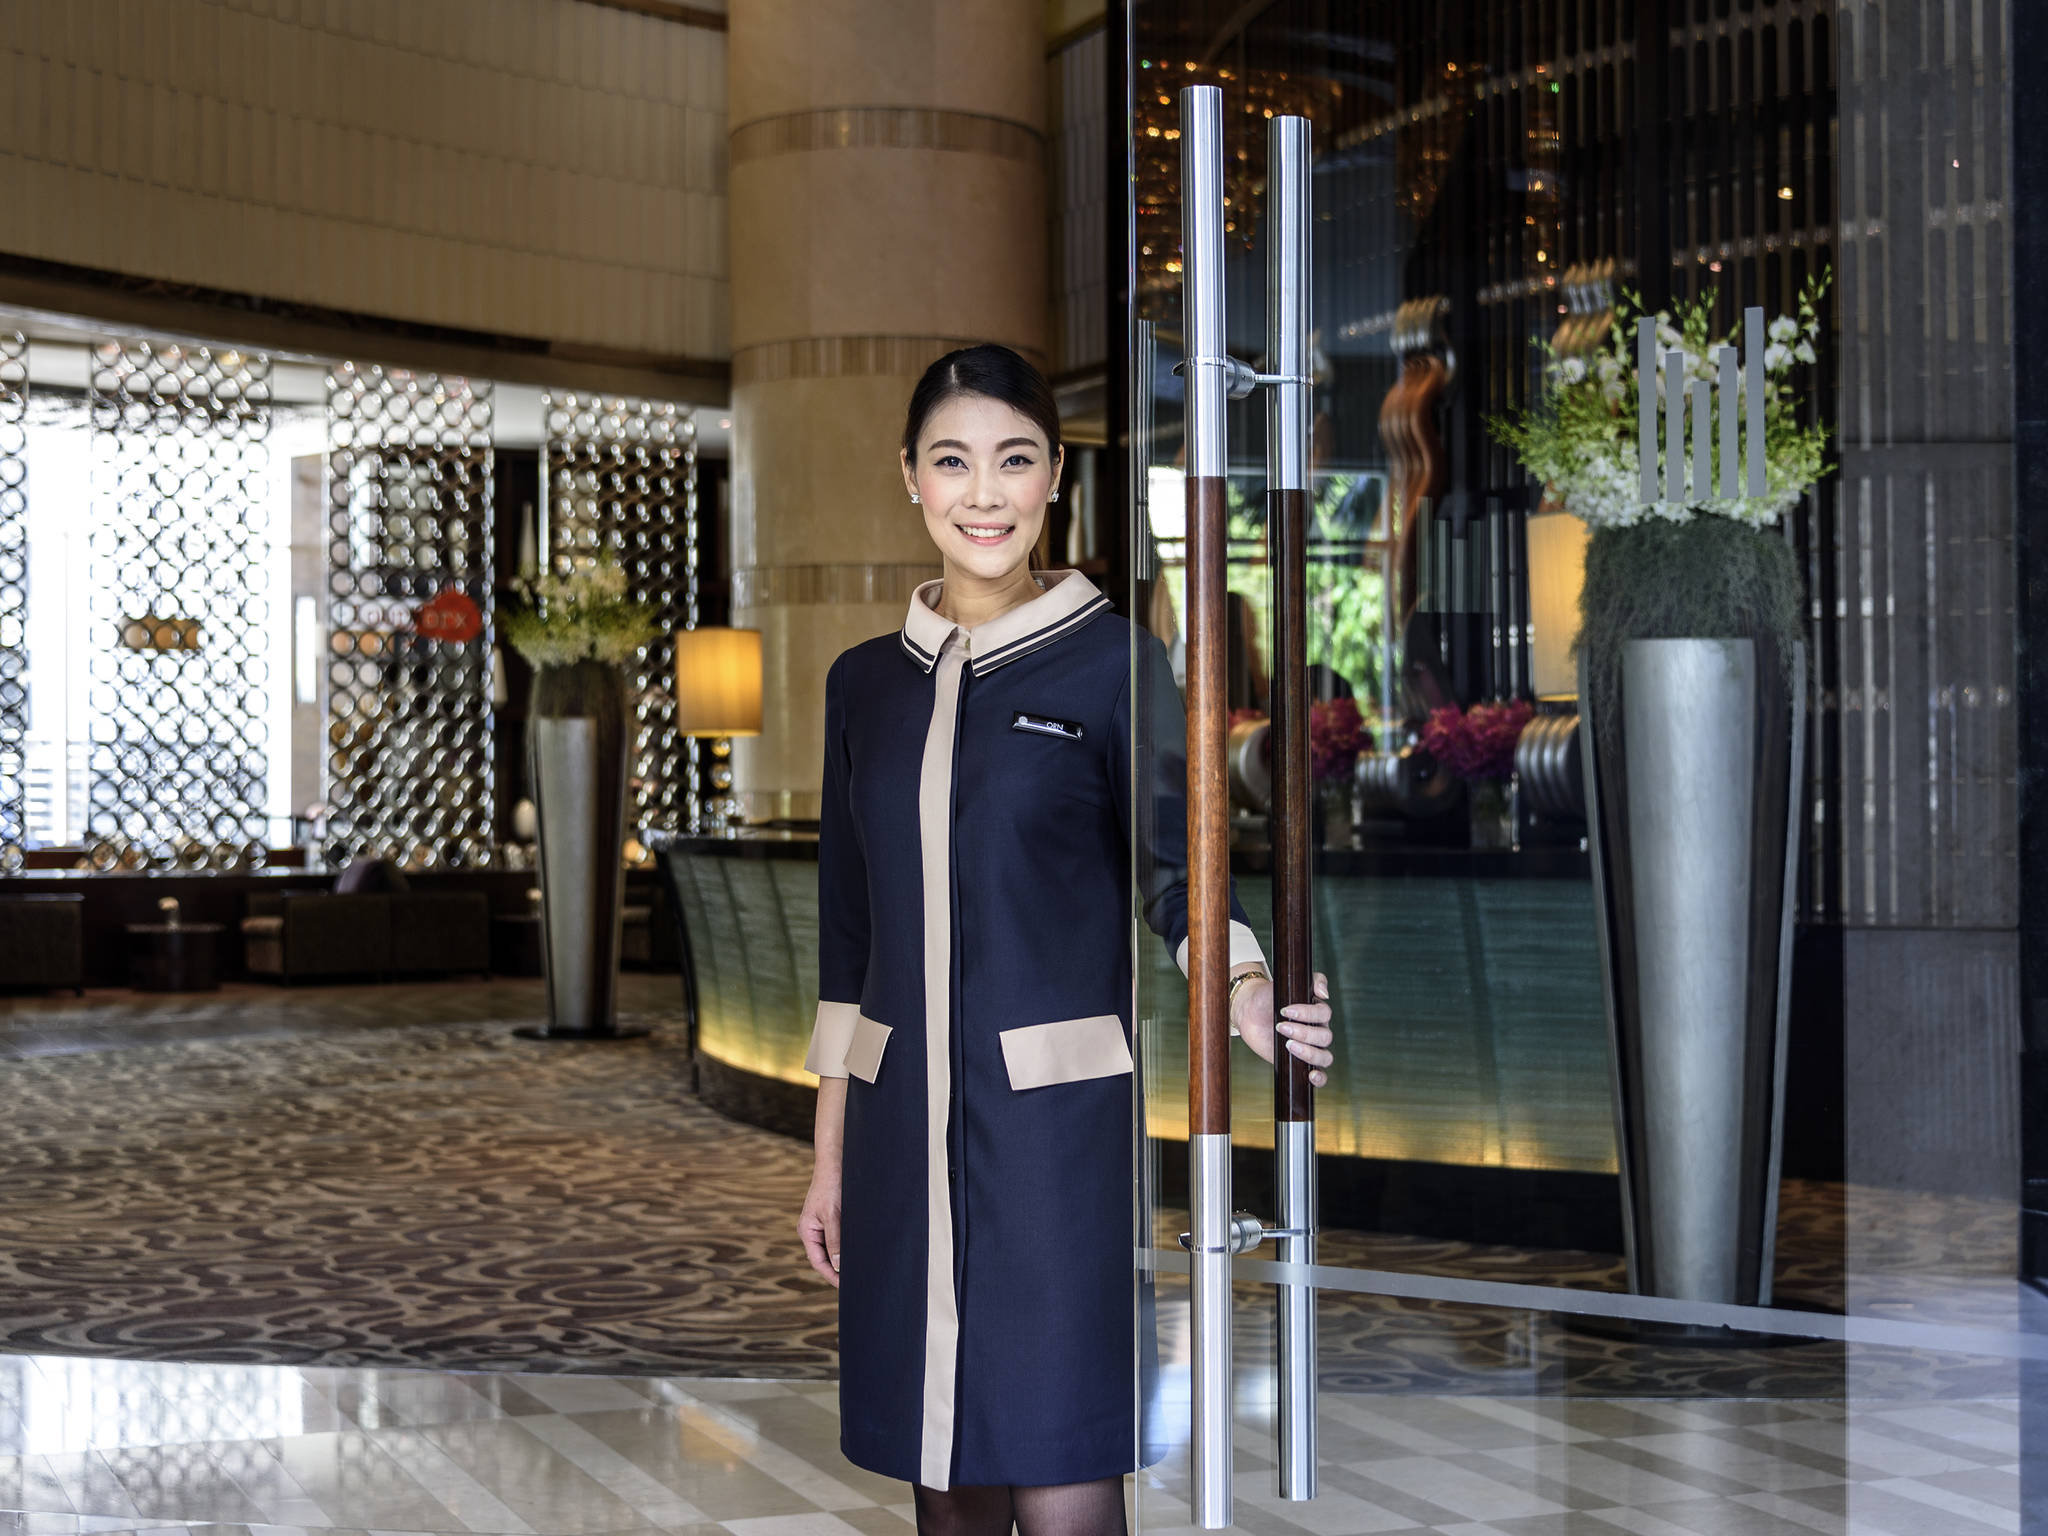 Hotel – Pullman Tianjin Kunlun (abre em junho de 2019)